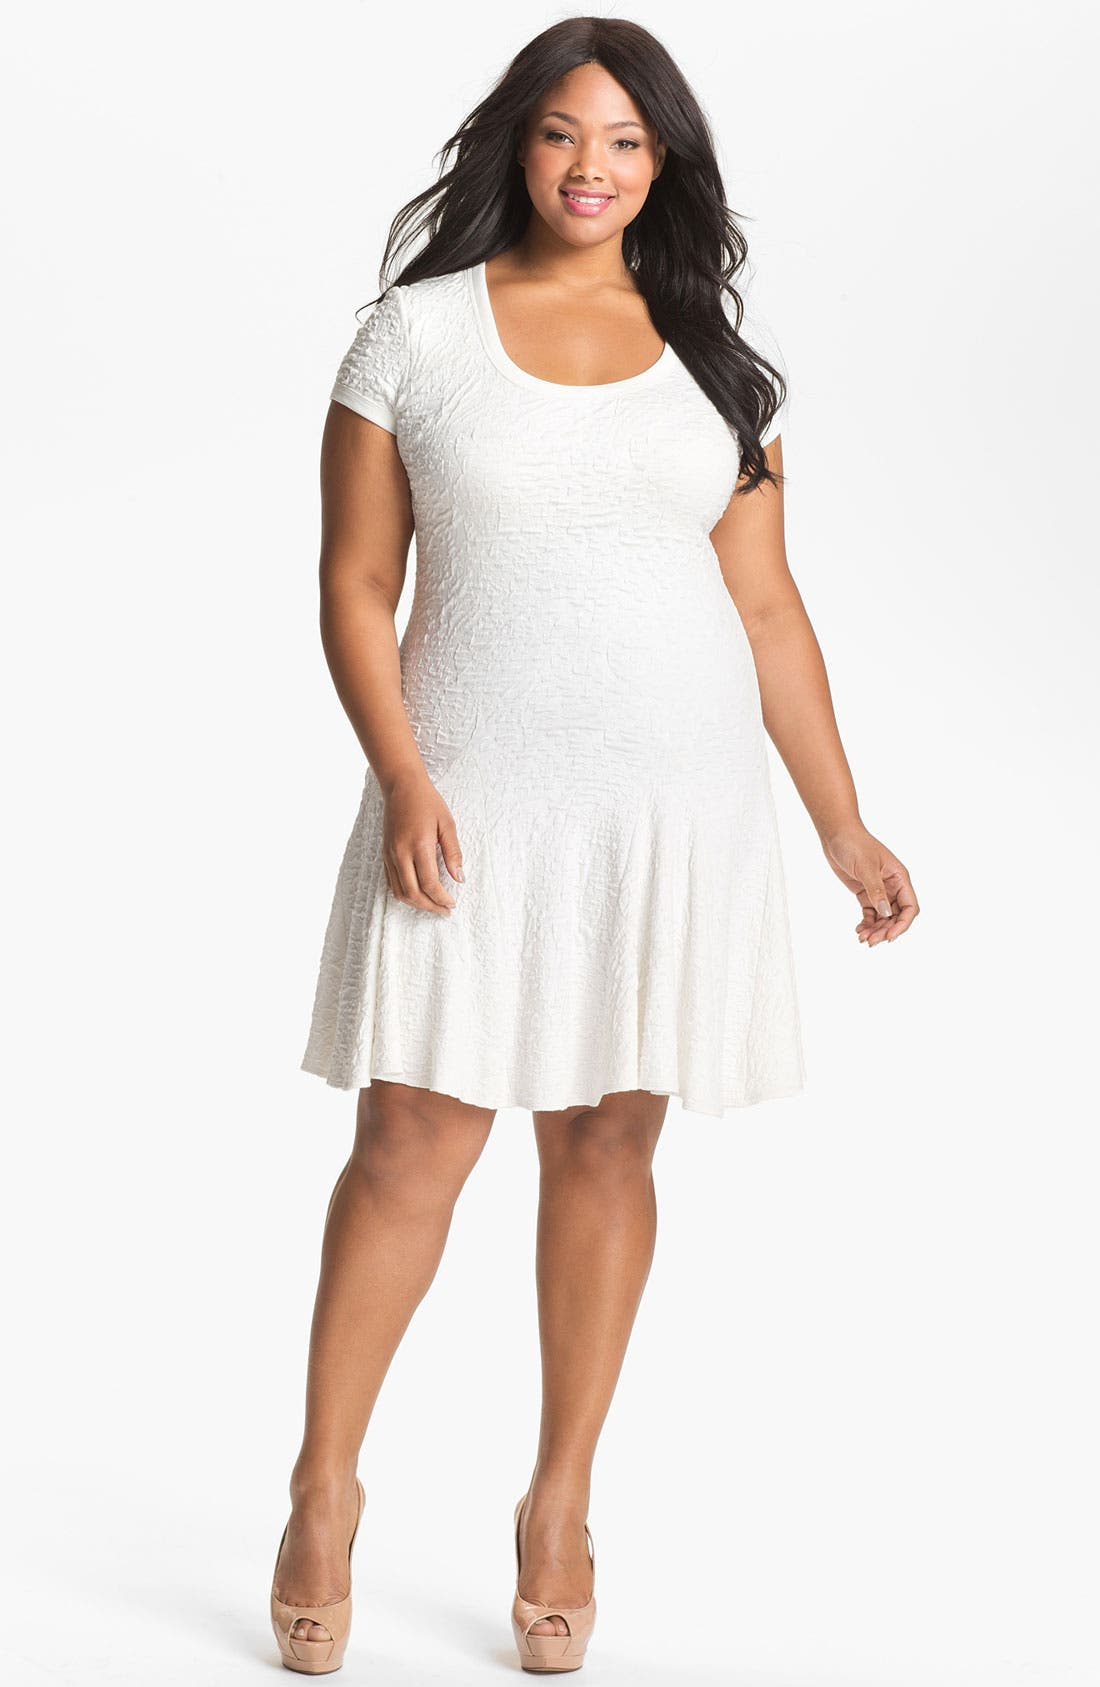 Alternate Image 1 Selected - A.B.S. by Allen Schwartz Textured Drop Waist Dress (Plus Size) (Online Only)